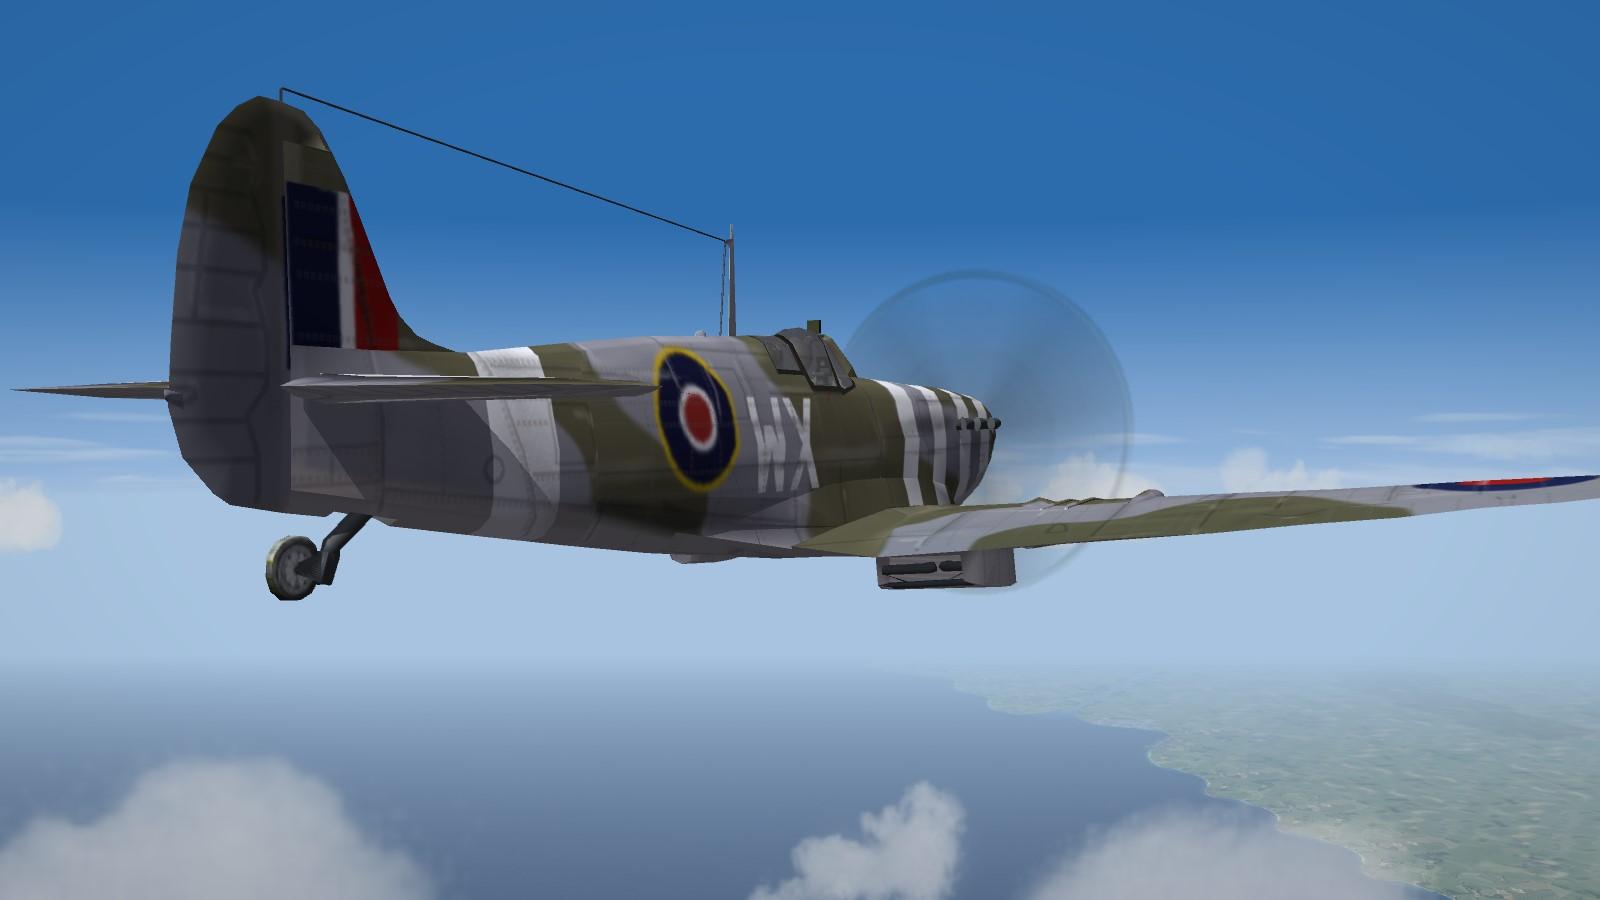 Spitfire Mk.Vb photorecon